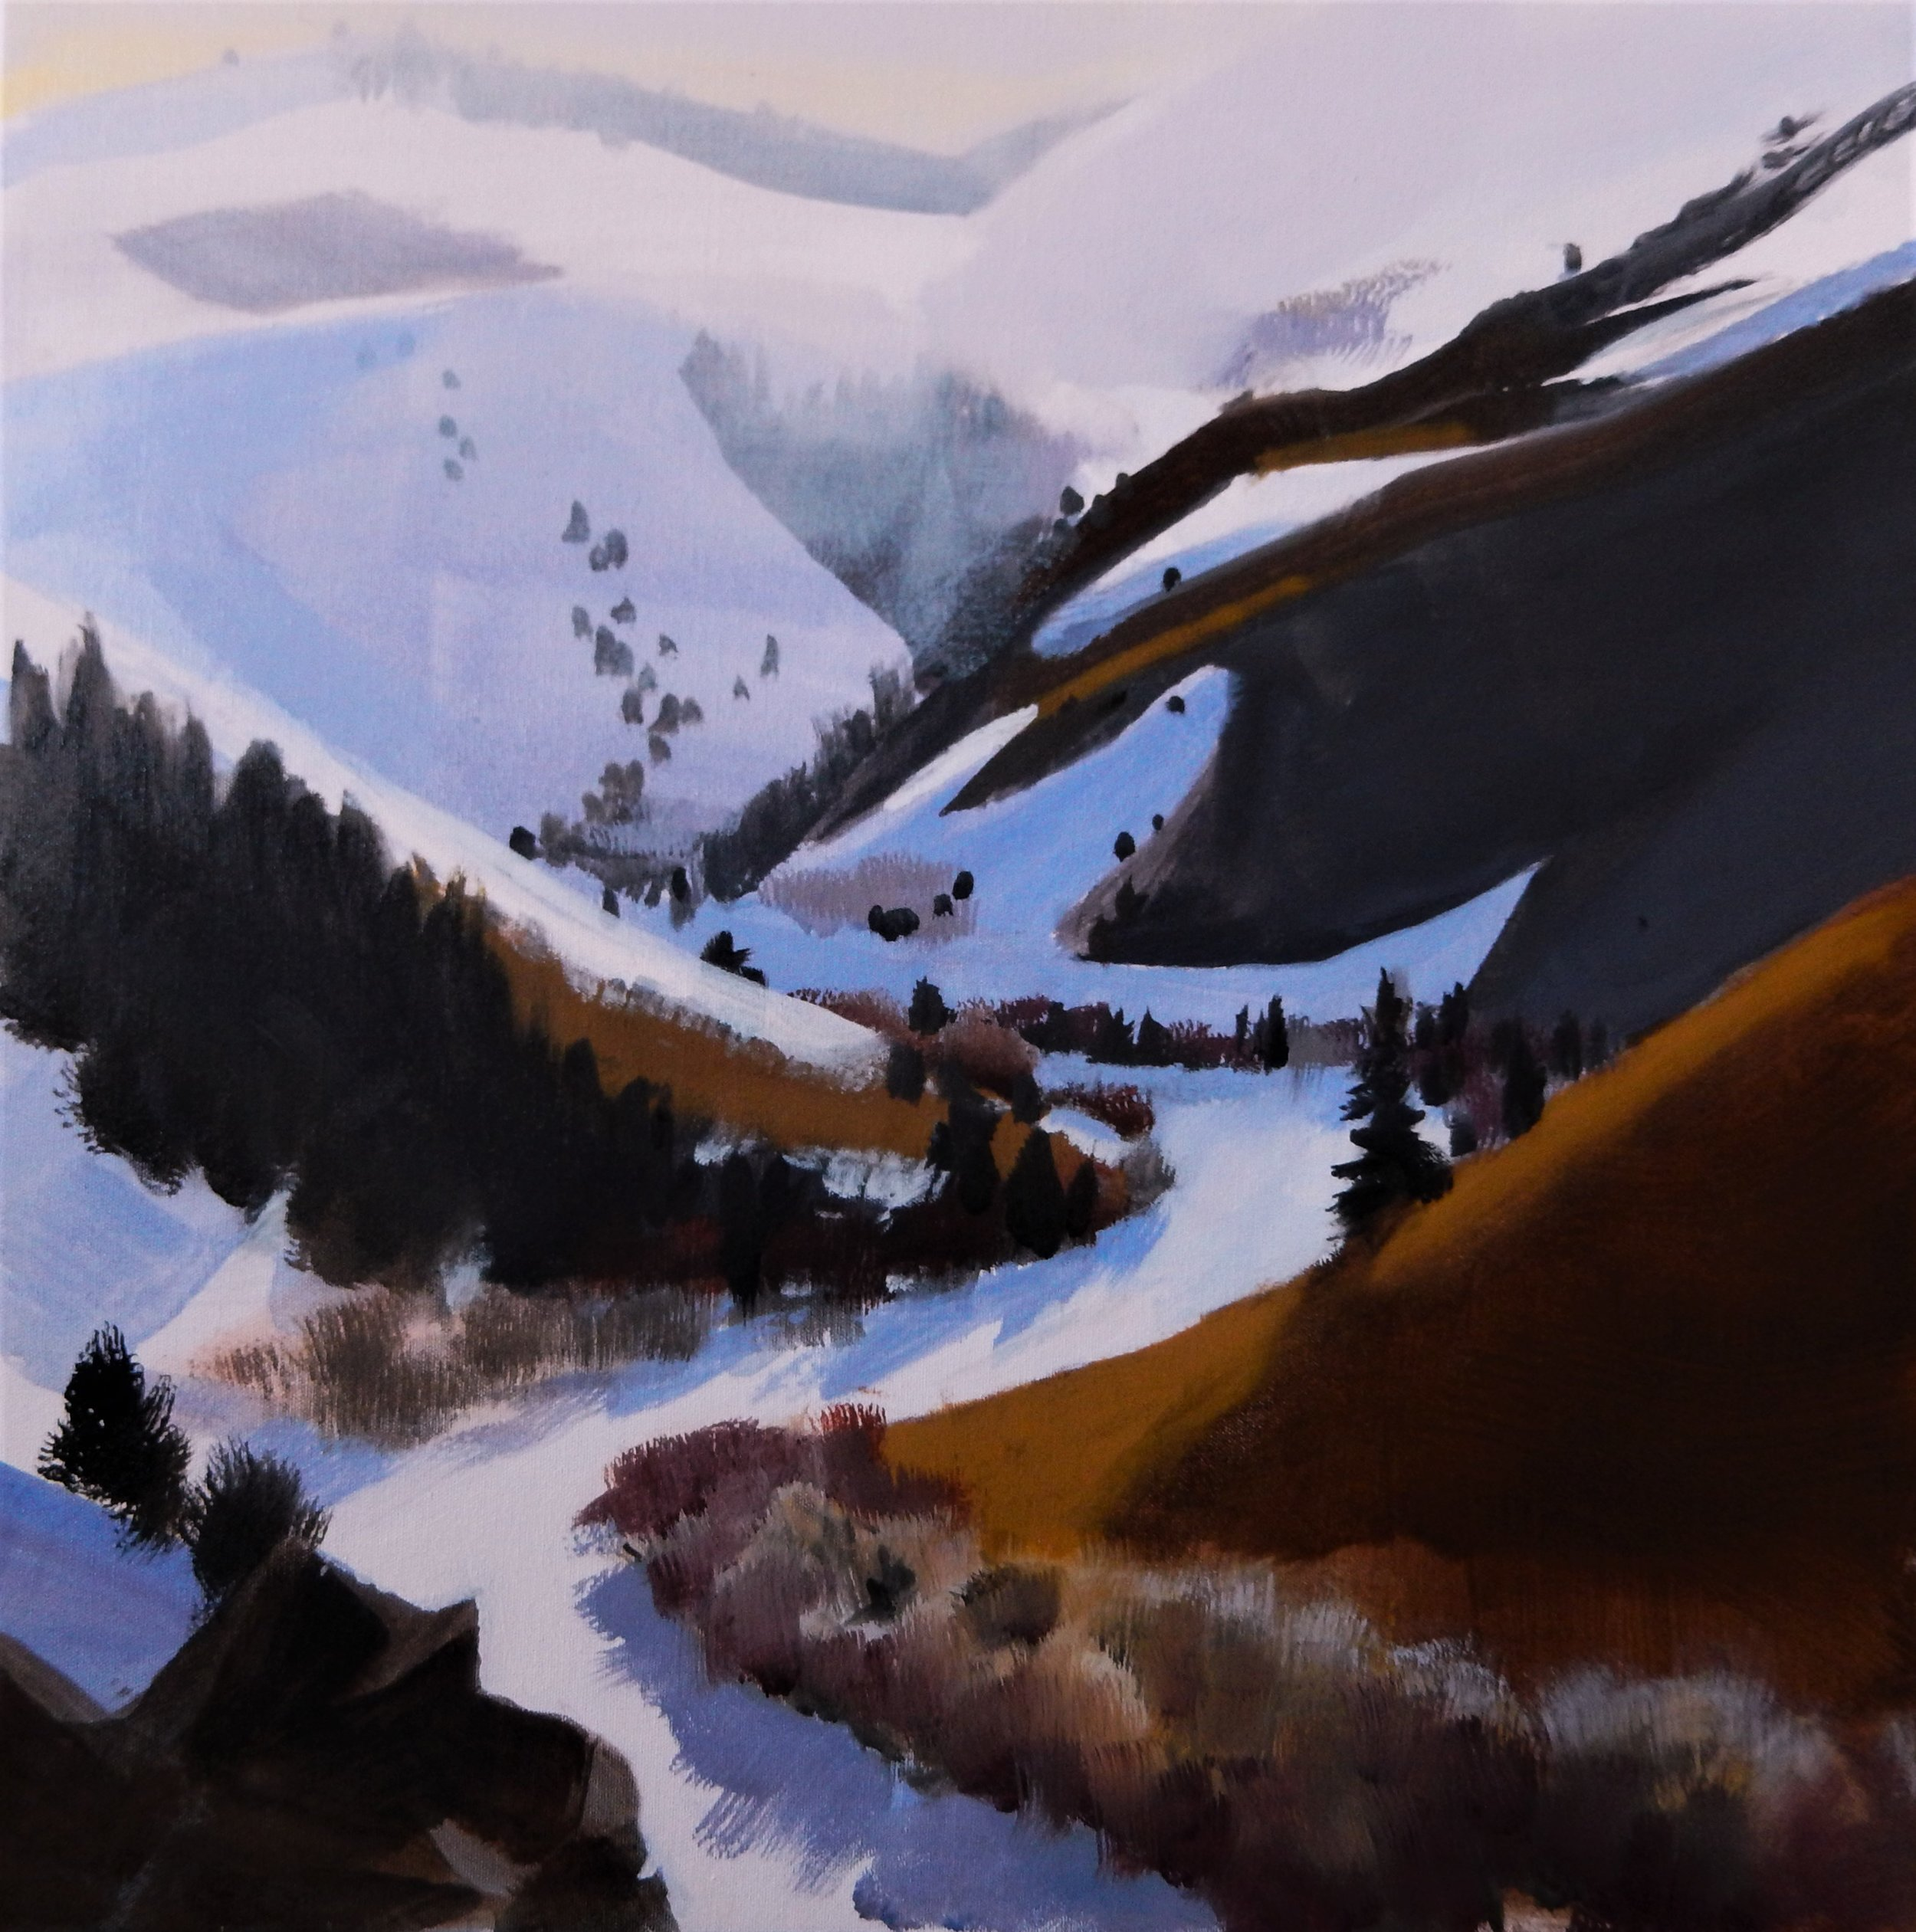 """Still Winter"" 24x24"" Oil Painting, 2017 by Jon Madsen"